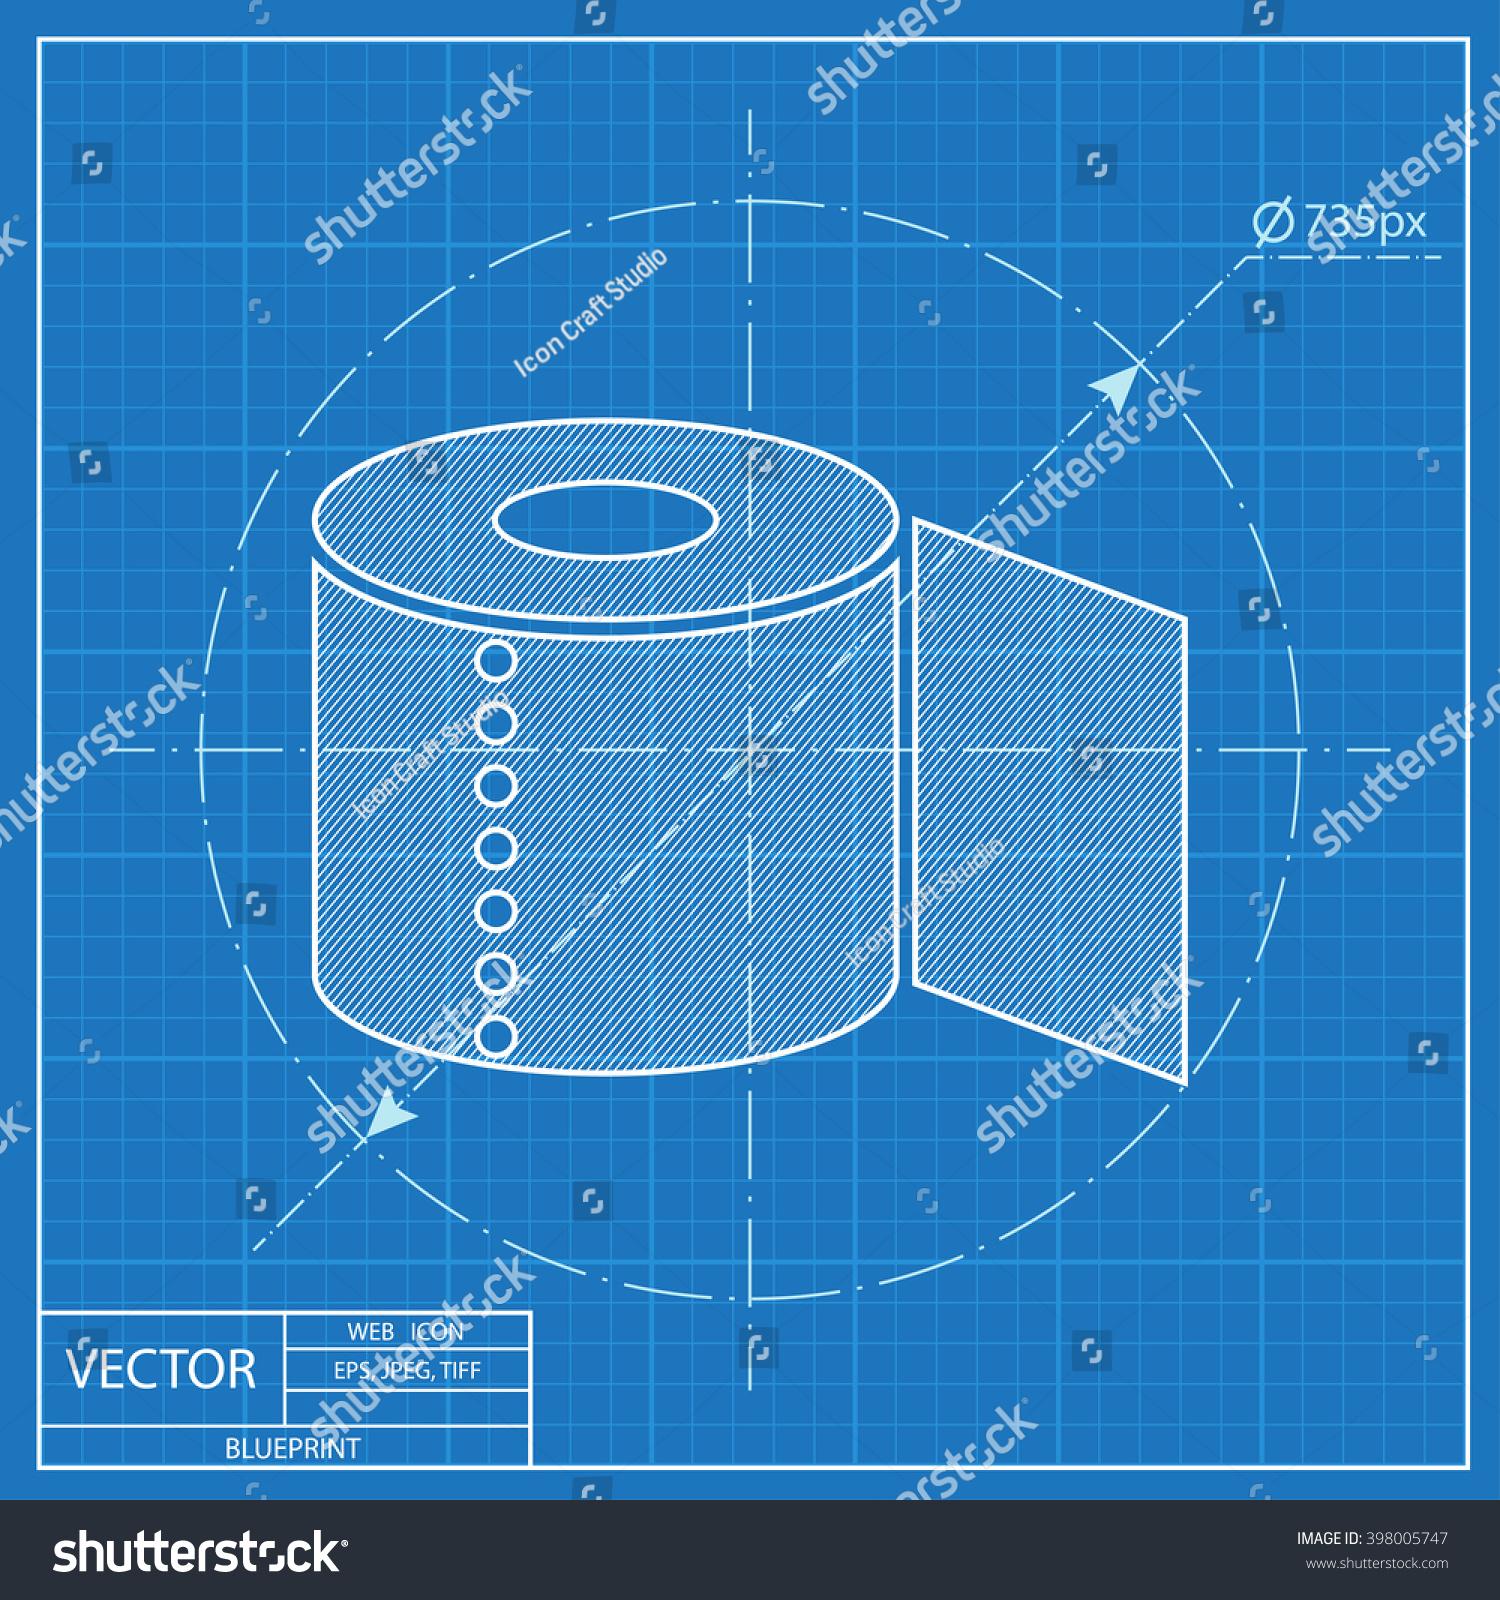 Toilet paper blueprint icon vectores en stock 398005747 shutterstock toilet paper blueprint icon malvernweather Image collections